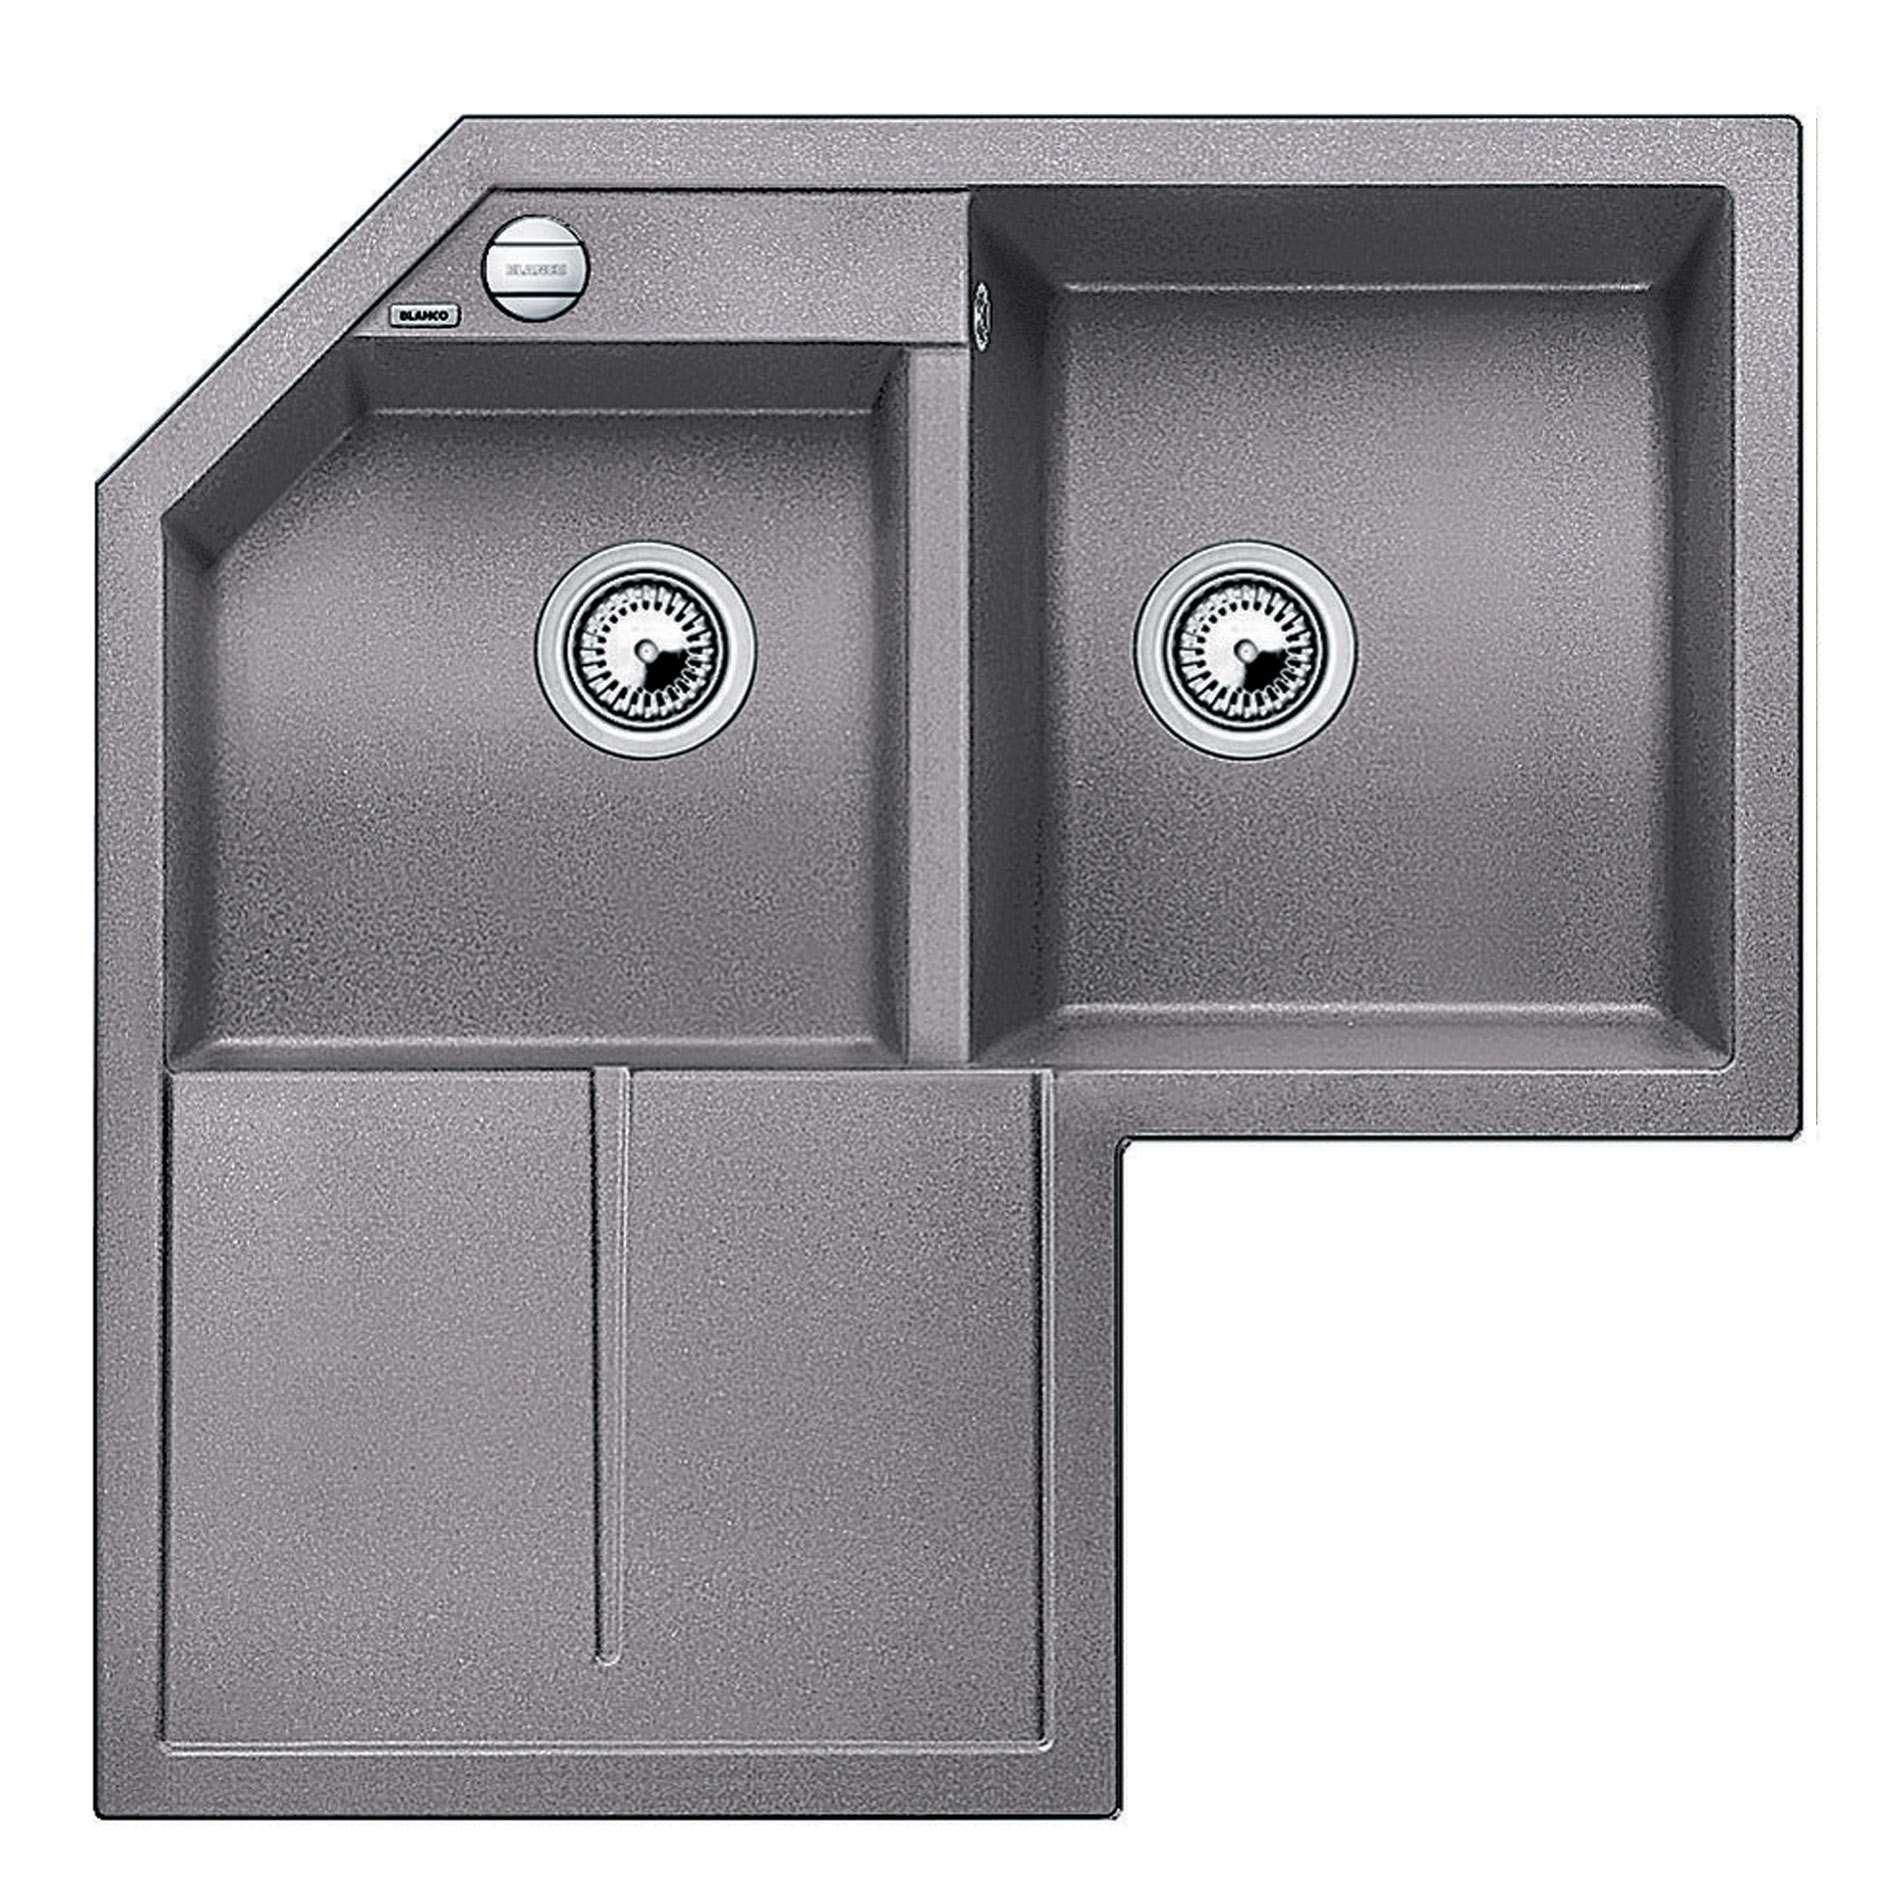 Picture of Metra 9 E Alumetallic Silgranit Sink